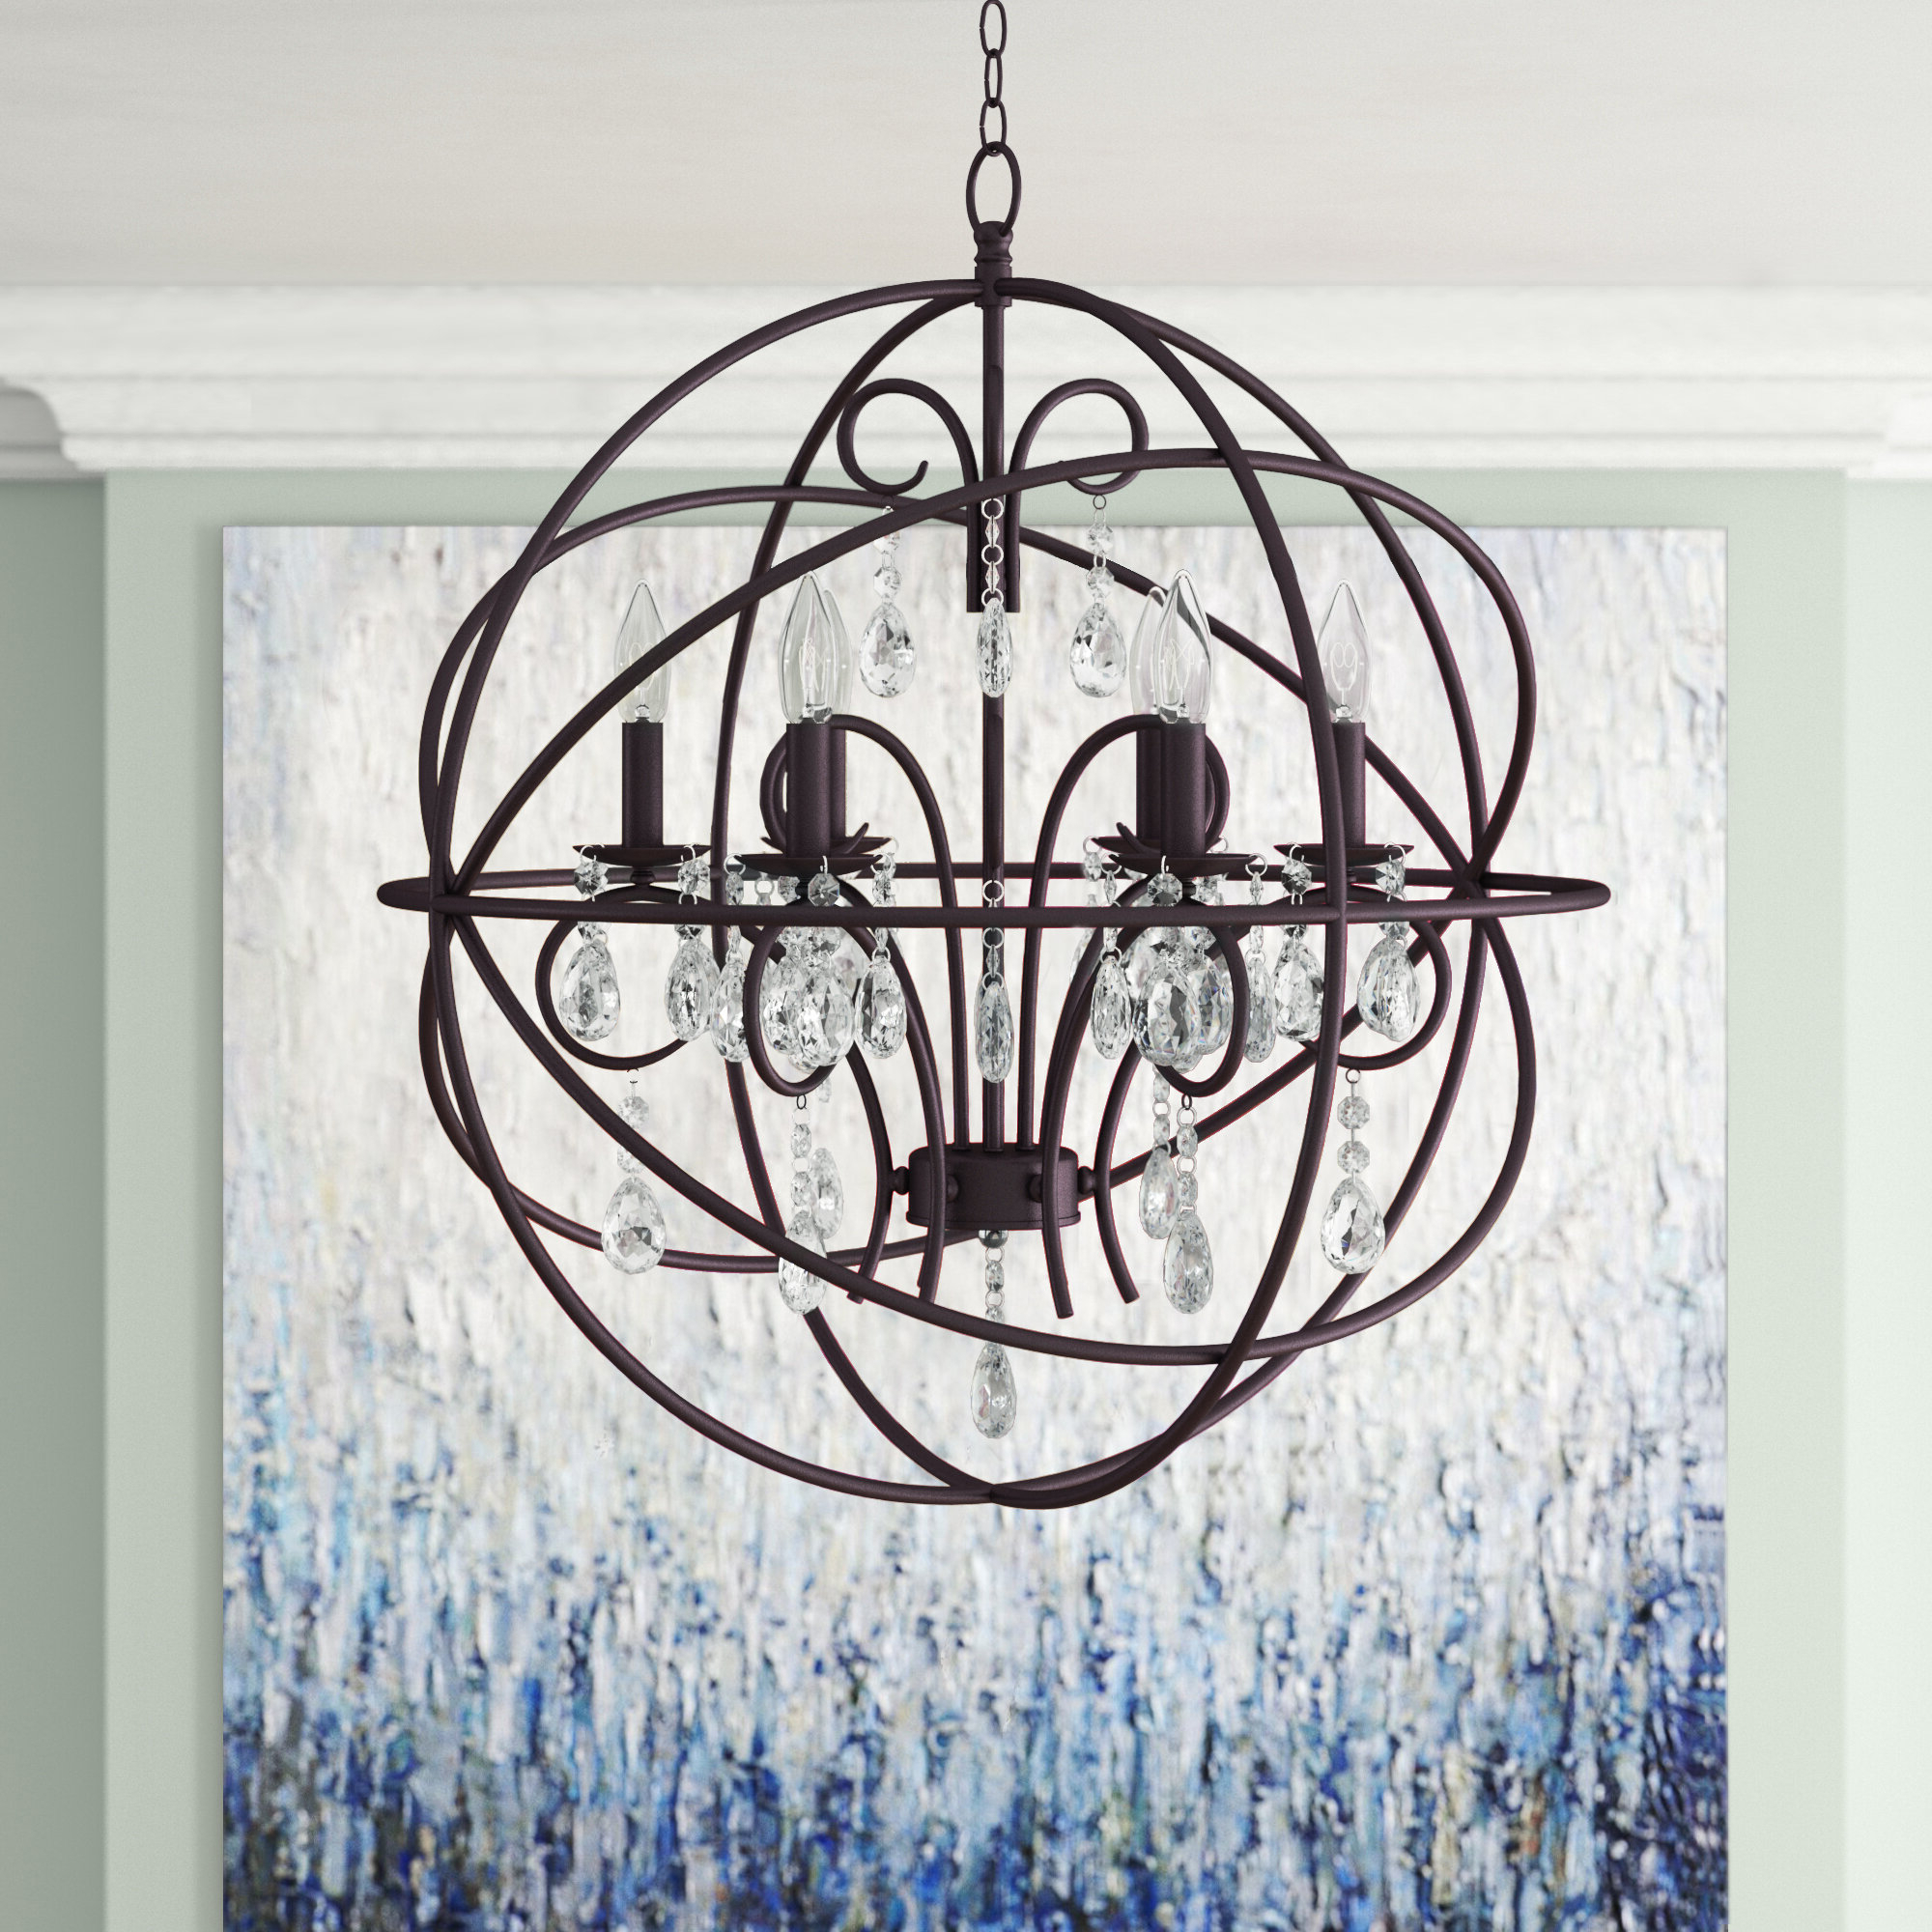 Willa Arlo Interiors Alden 6 Light Globe Chandelier Regarding Widely Used Eastbourne 6 Light Unique / Statement Chandeliers (Gallery 9 of 20)